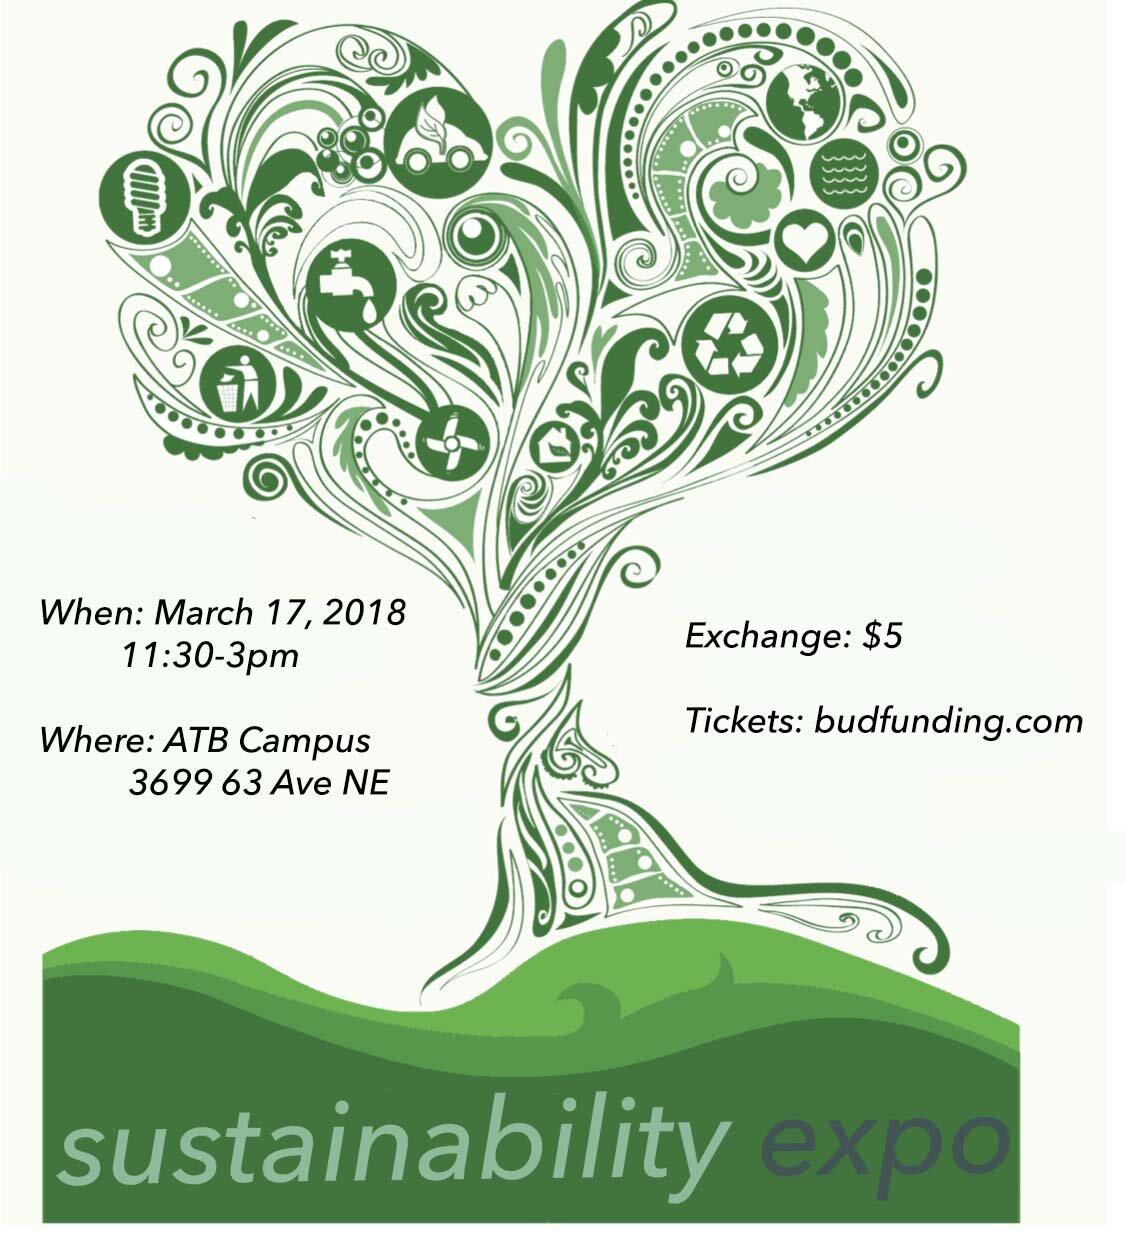 Sustainabilitytree.jpg